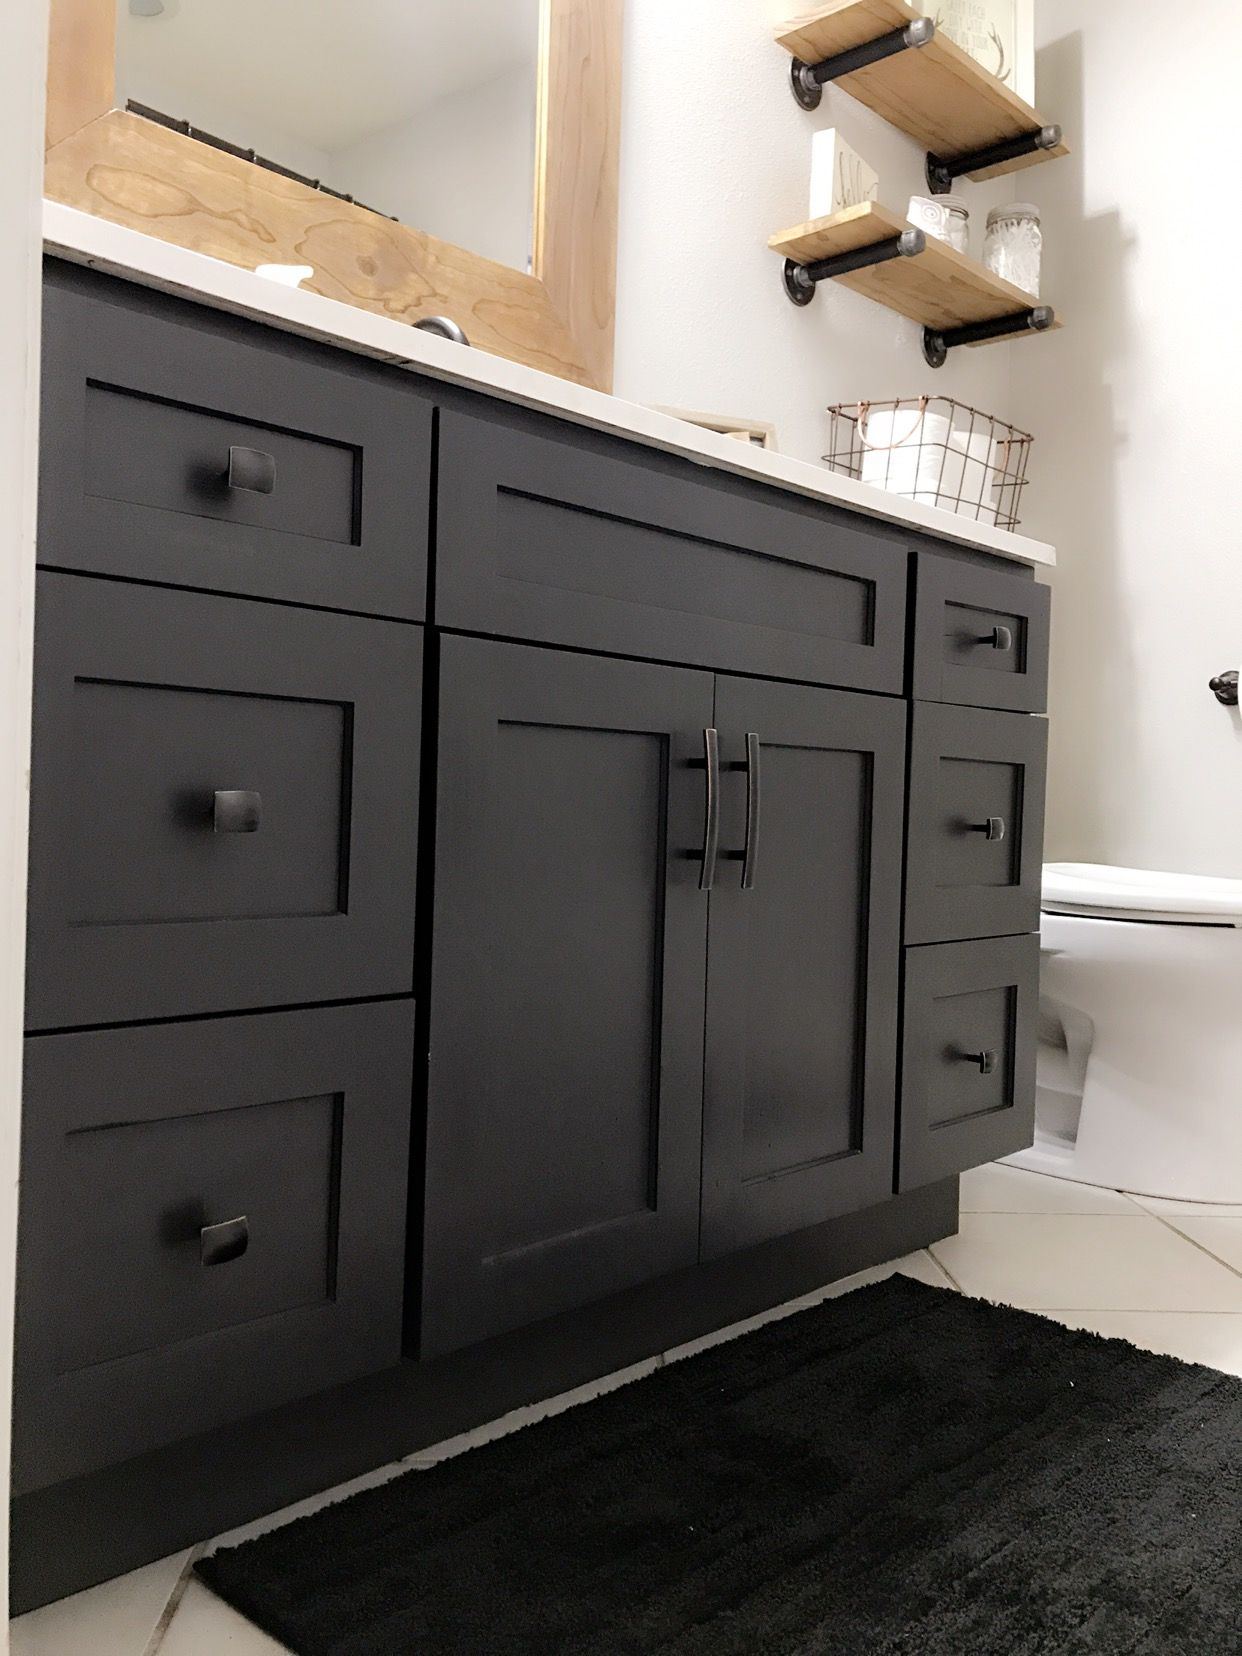 Vanity Painted With Fusion Ash Chalk Paint Farmhousestyle Painted Vanity Bathroom Black Vanity Bathroom Painted Vanity [ 1656 x 1242 Pixel ]